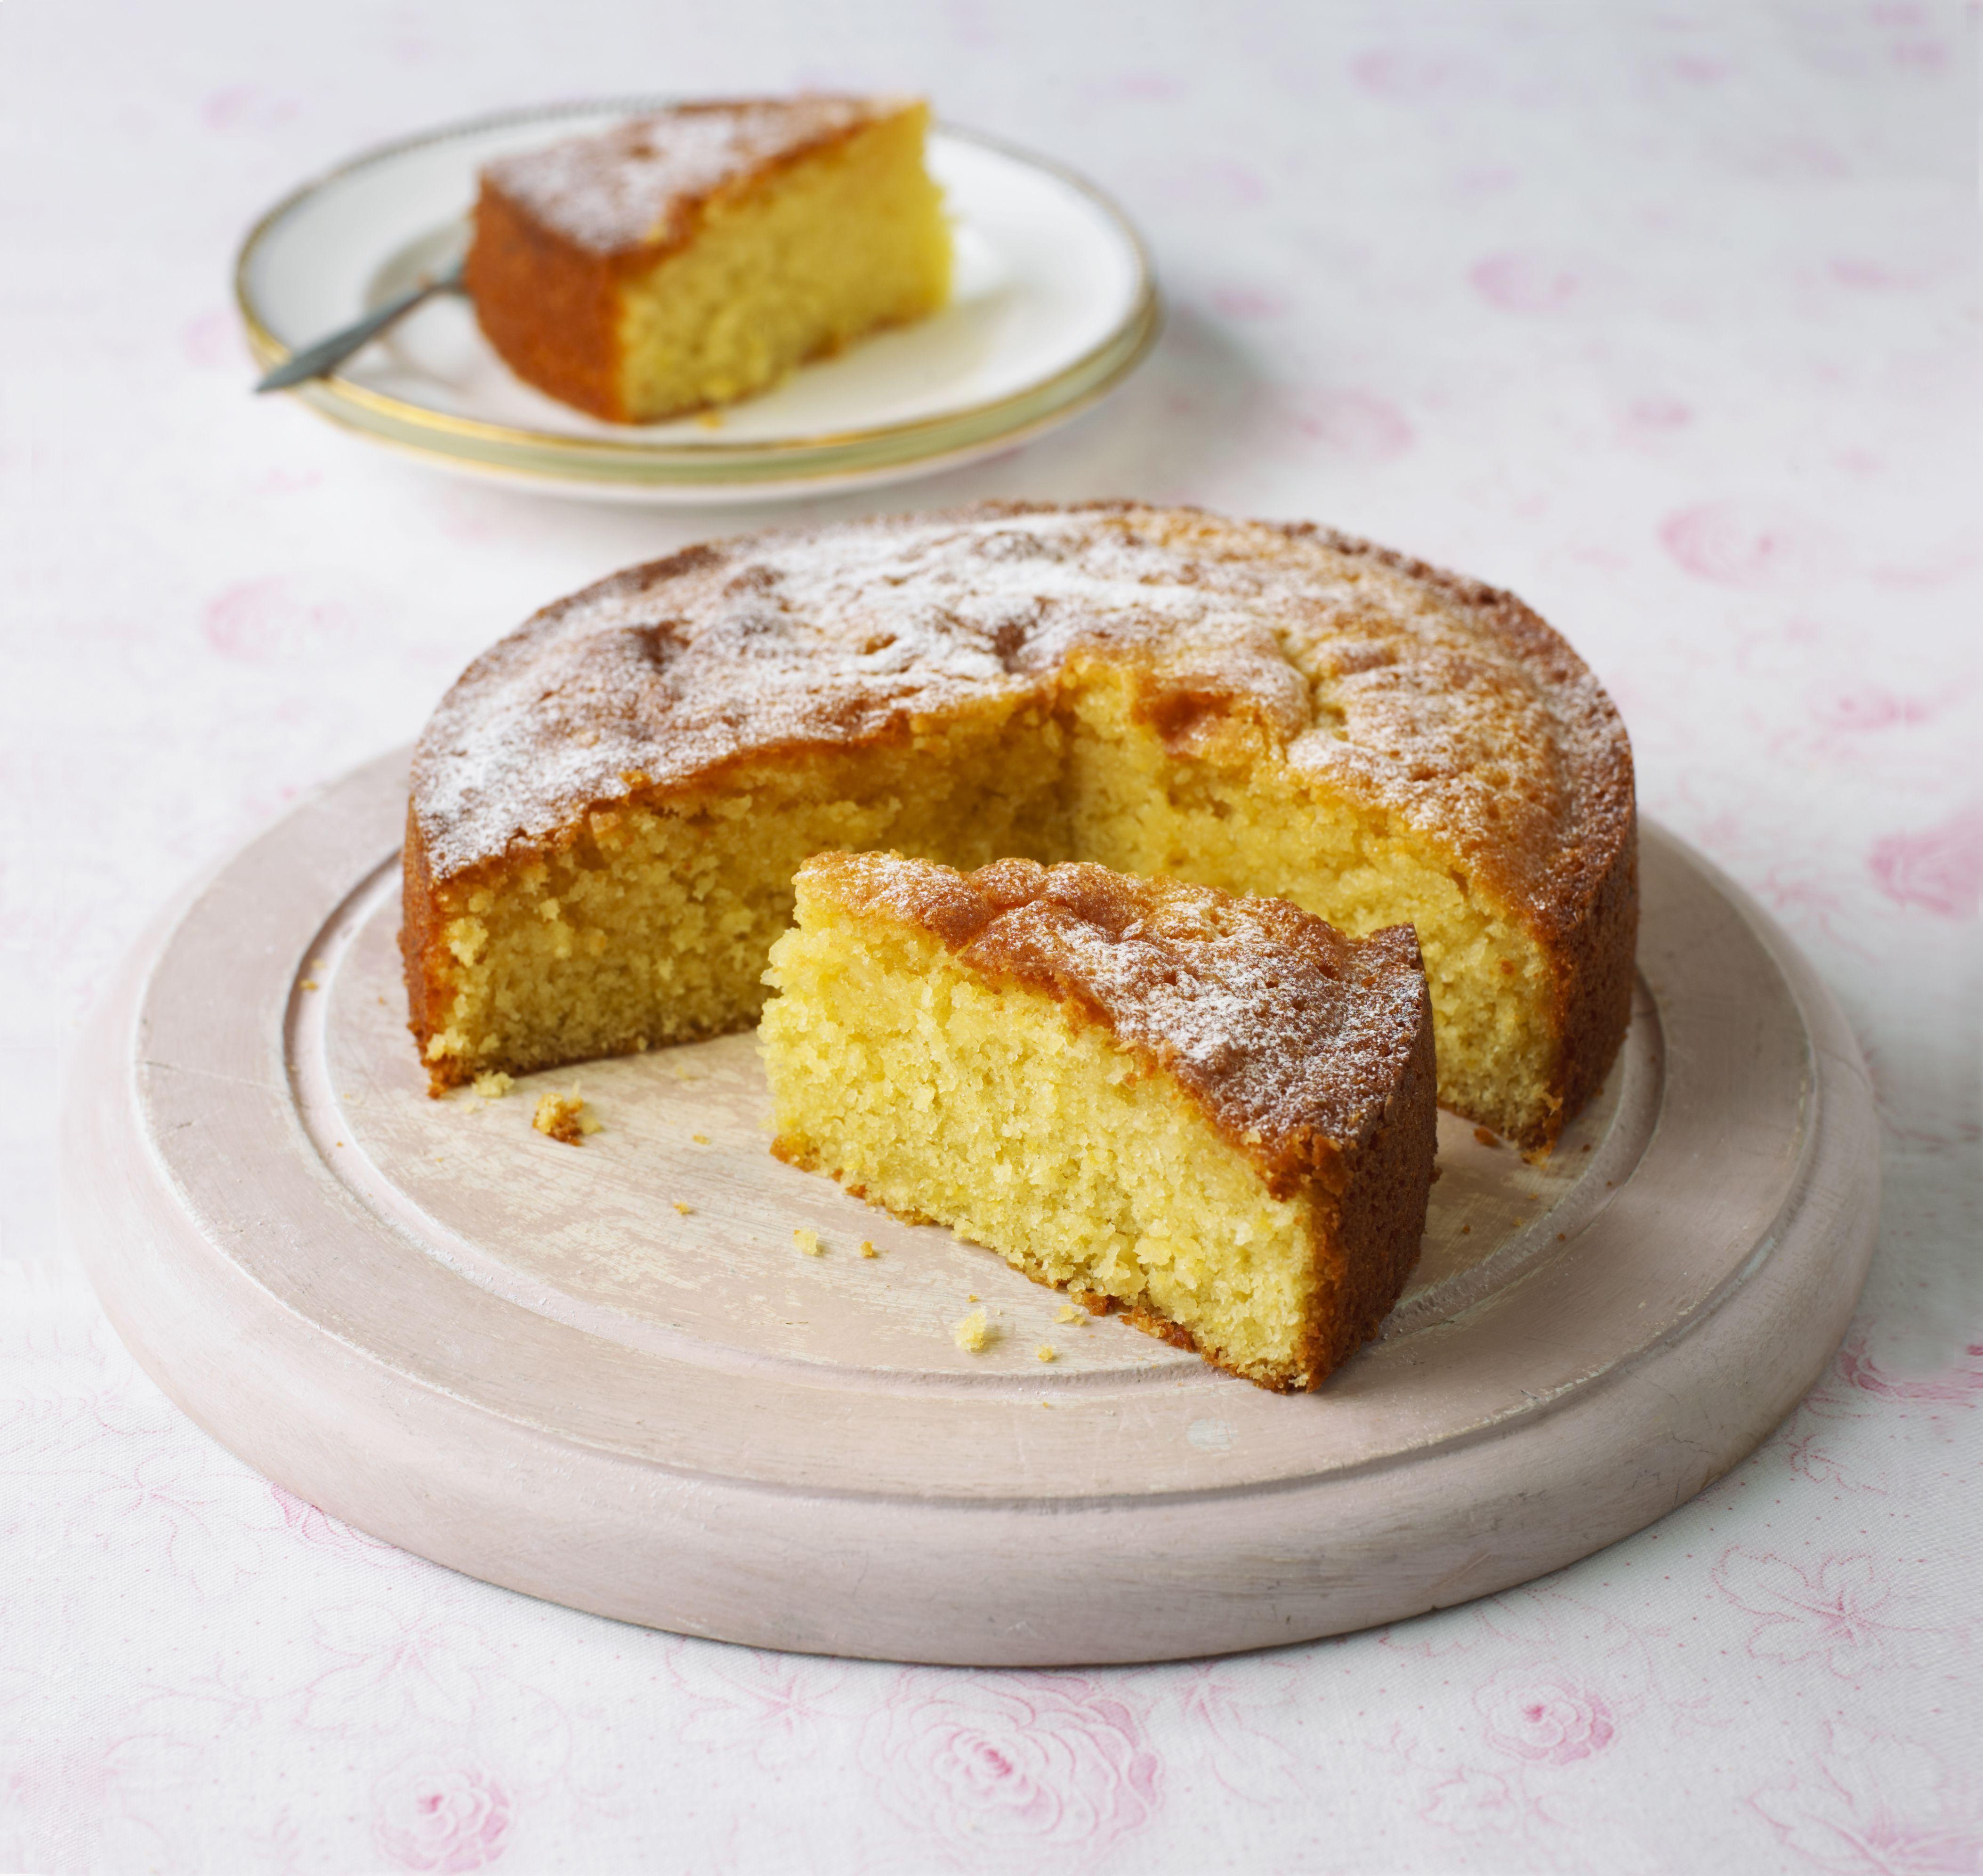 Easy lemon pudding cake from a mix recipe lemon glaze